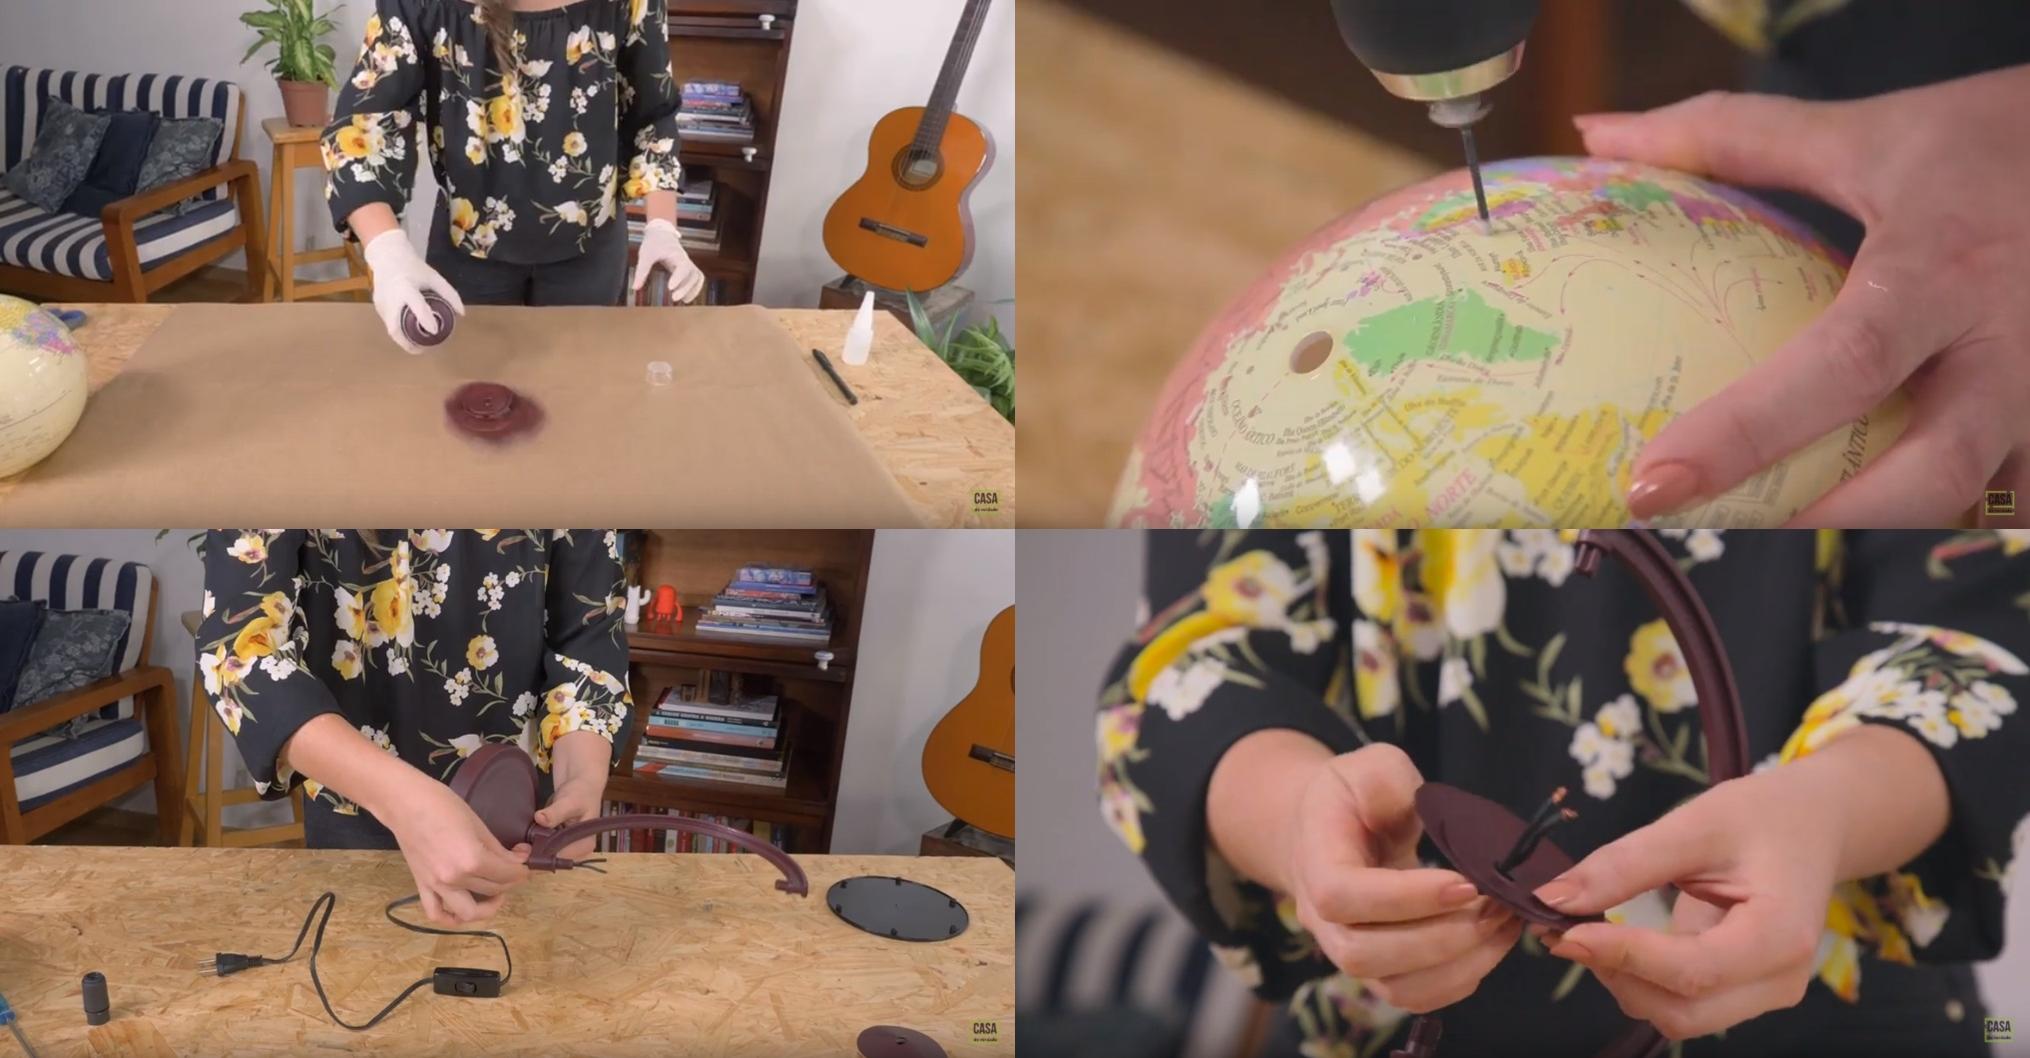 Pintando os círculos colados, furando o globo, passando o fio pela haste e passando os círculos pintados pelo fio.